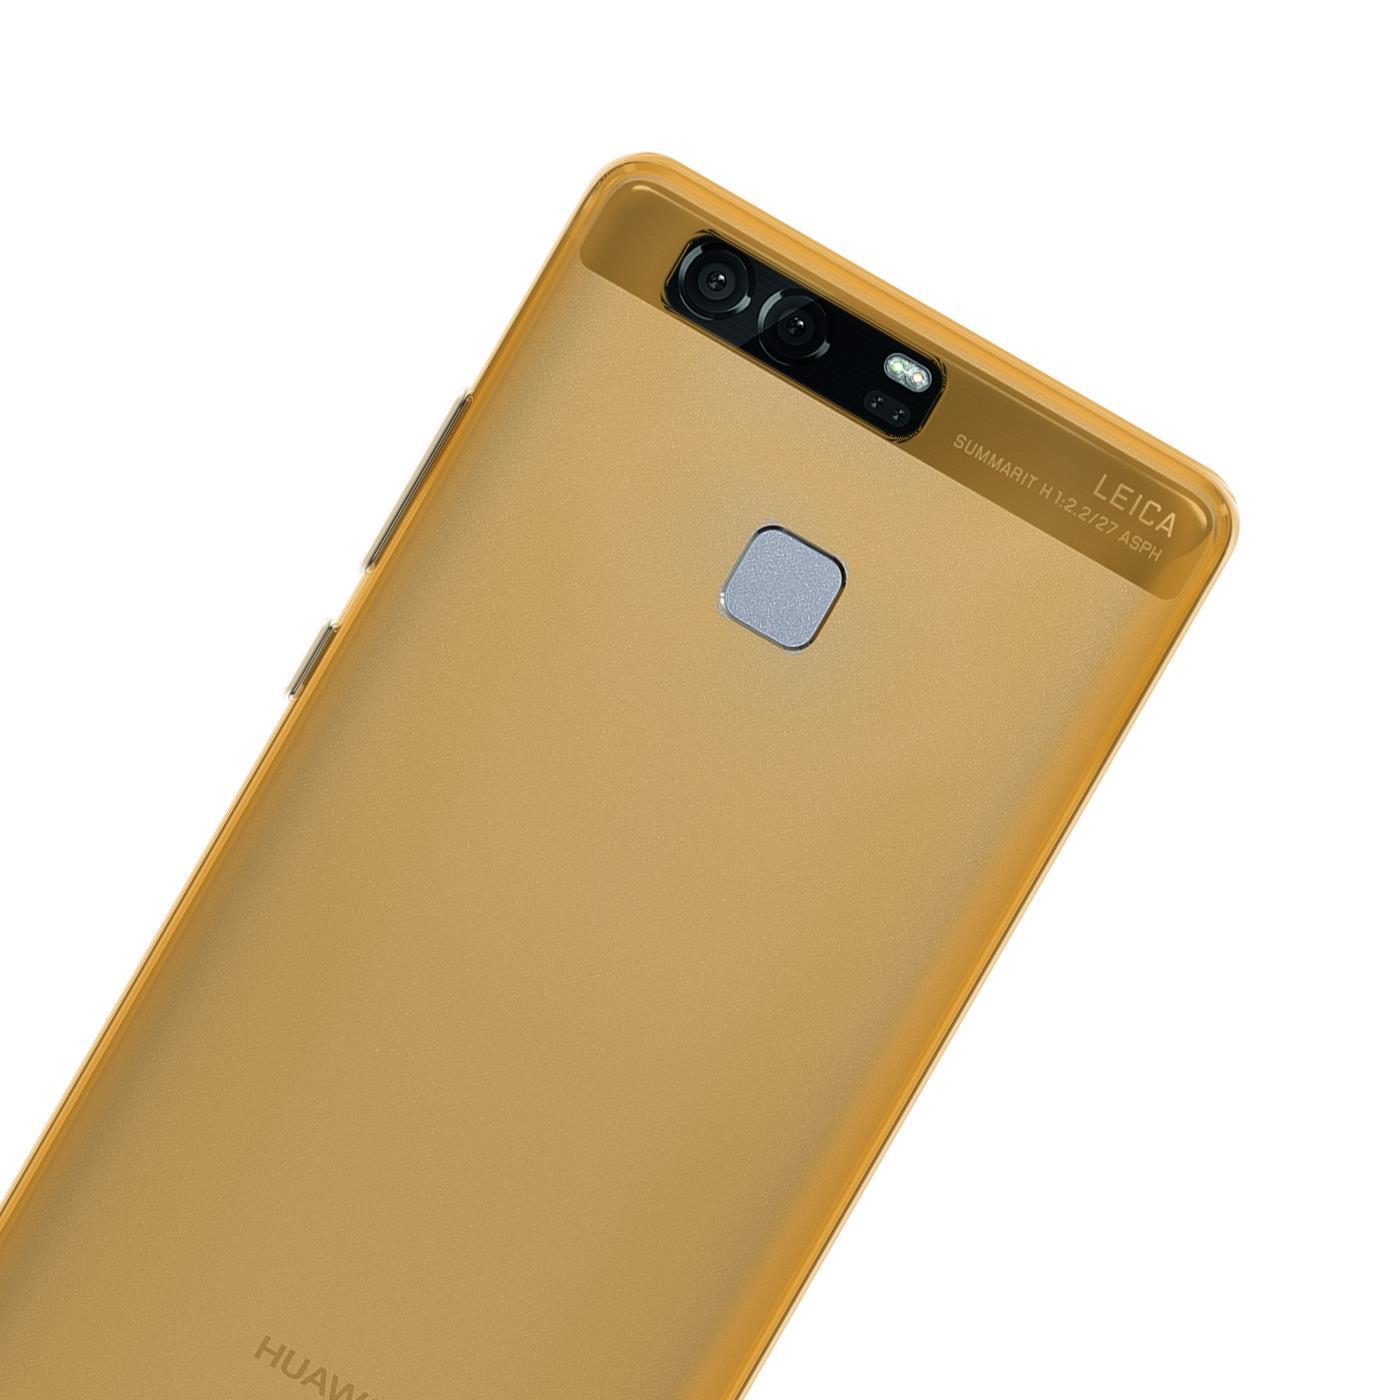 Huawei-p9-Duenn-Silikon-Klar-Case-Cover-Ultra-Slim-Stossfeste-Gel-Rueckseite Indexbild 18